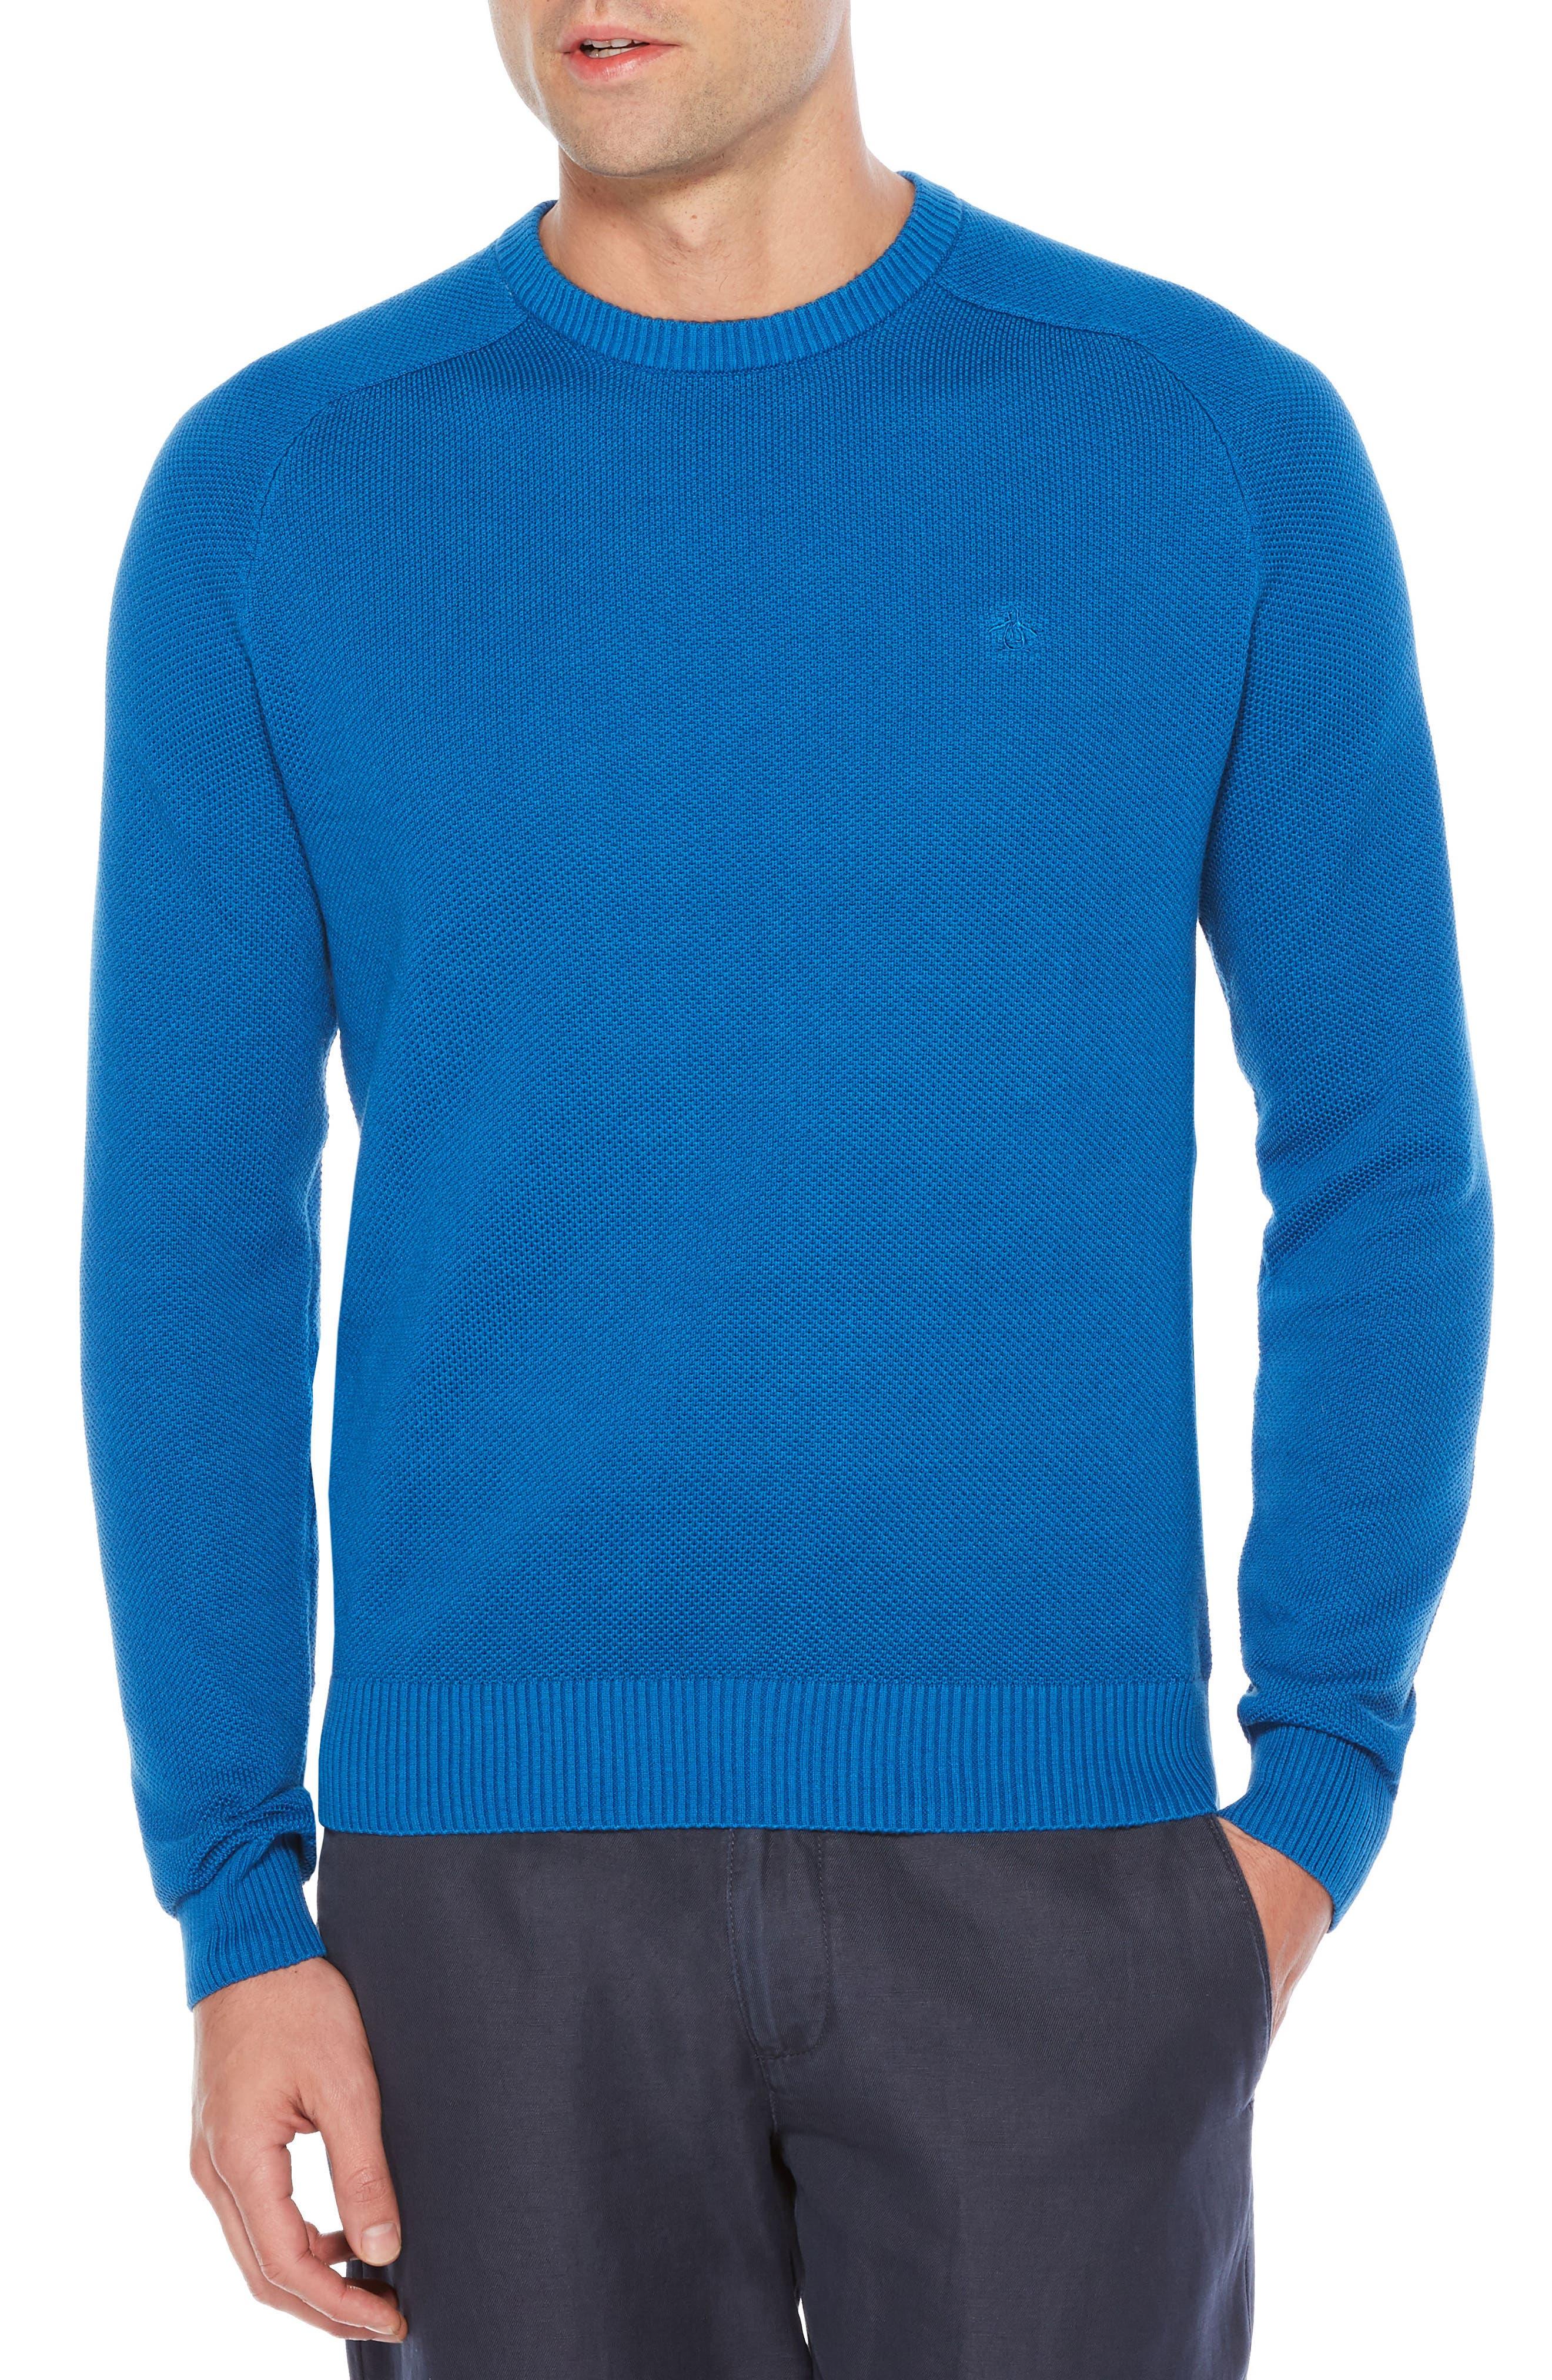 Honeycomb Piqué Sweater,                         Main,                         color, 403